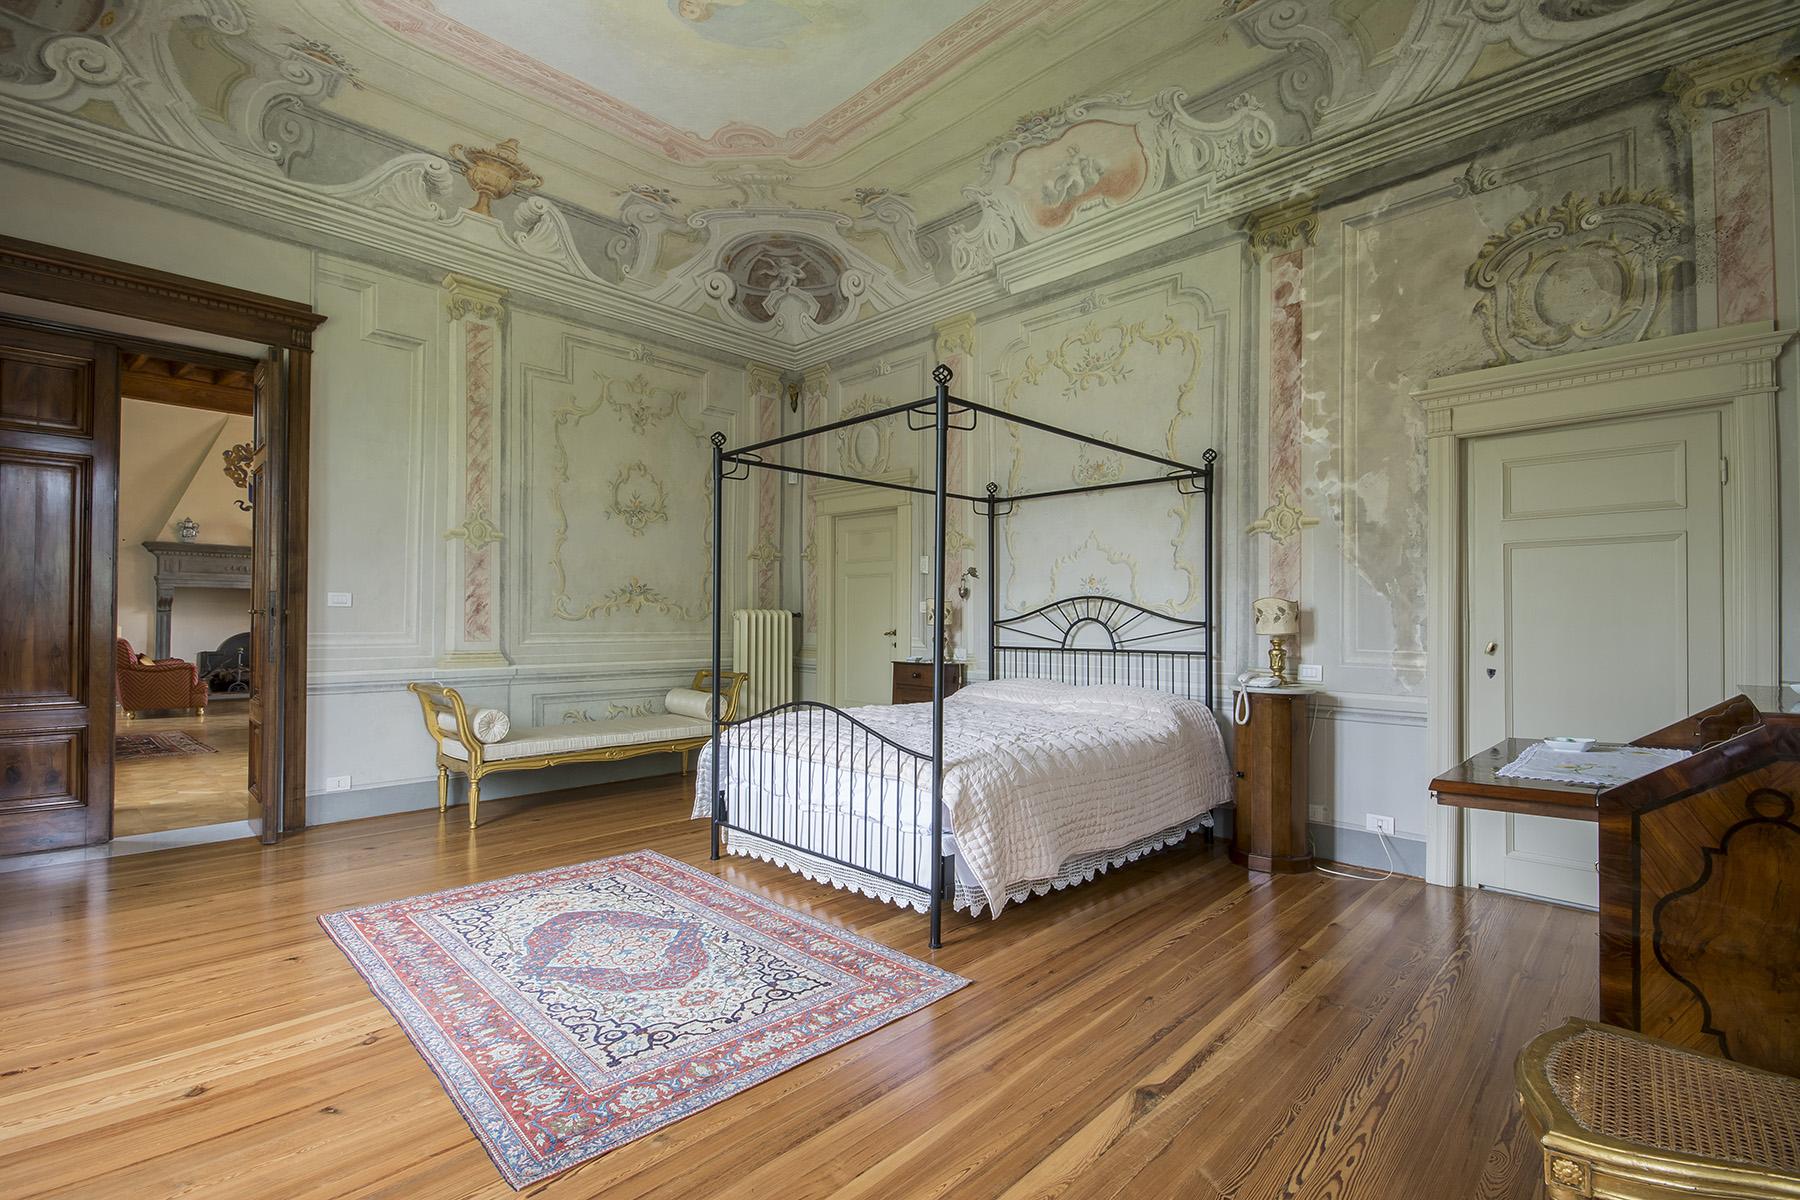 Villa in Vendita a Lucca: 5 locali, 1200 mq - Foto 14